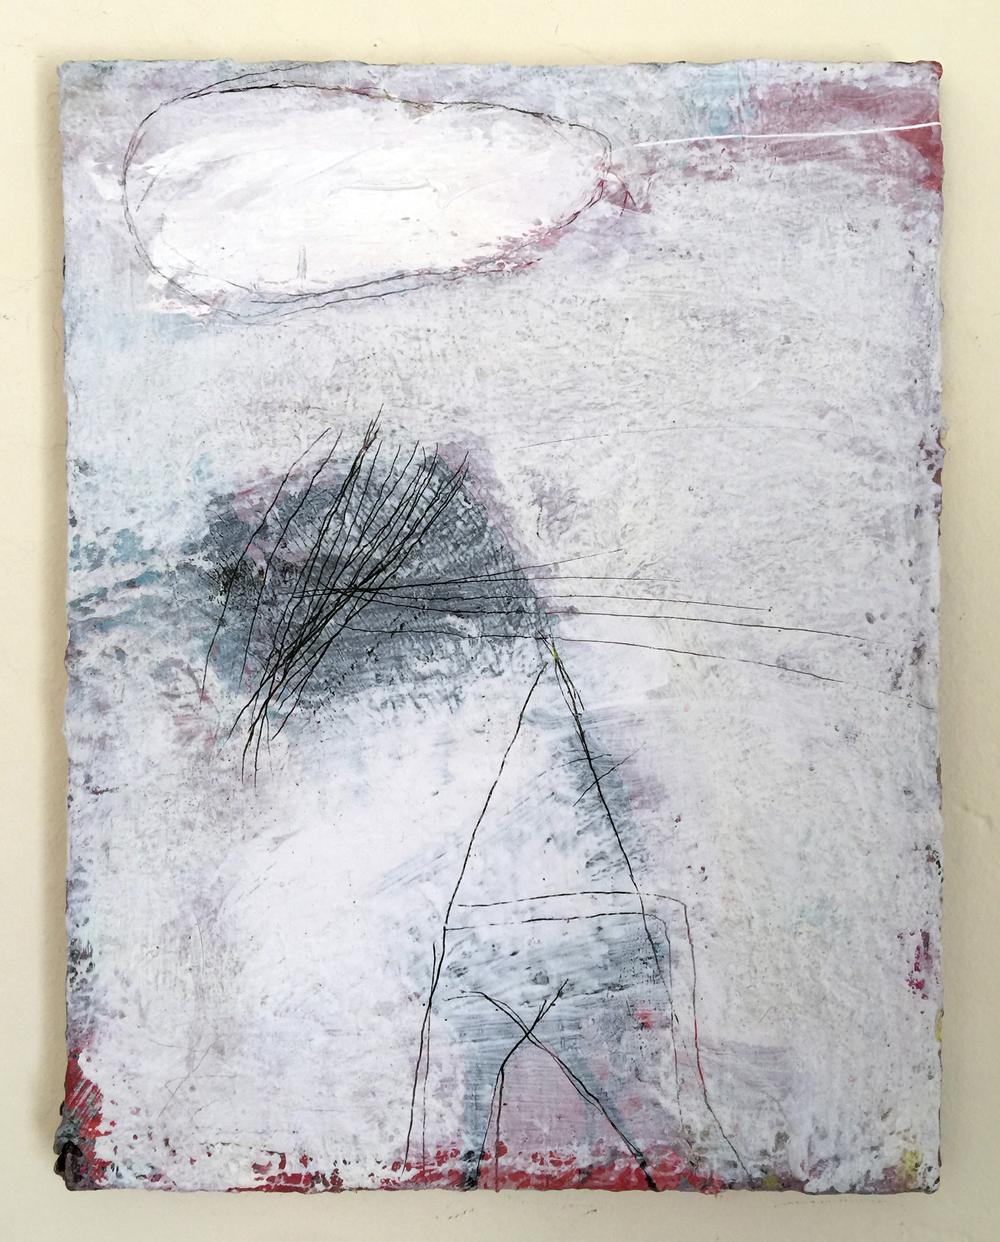 Untitled 1, $2500